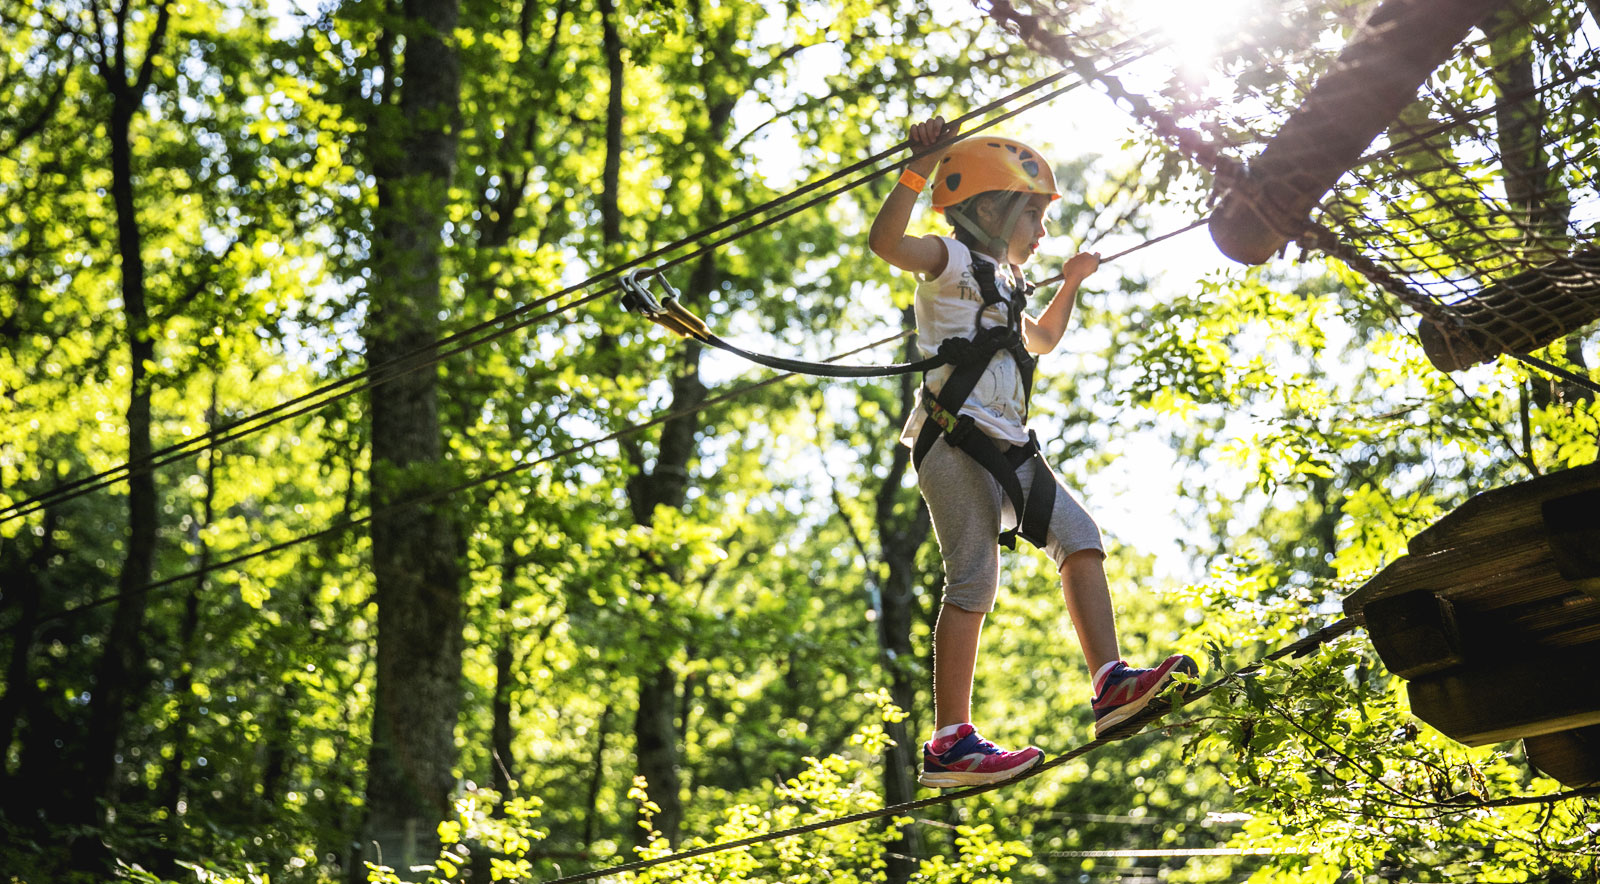 parco-avventura-sport-outdoor-rimini